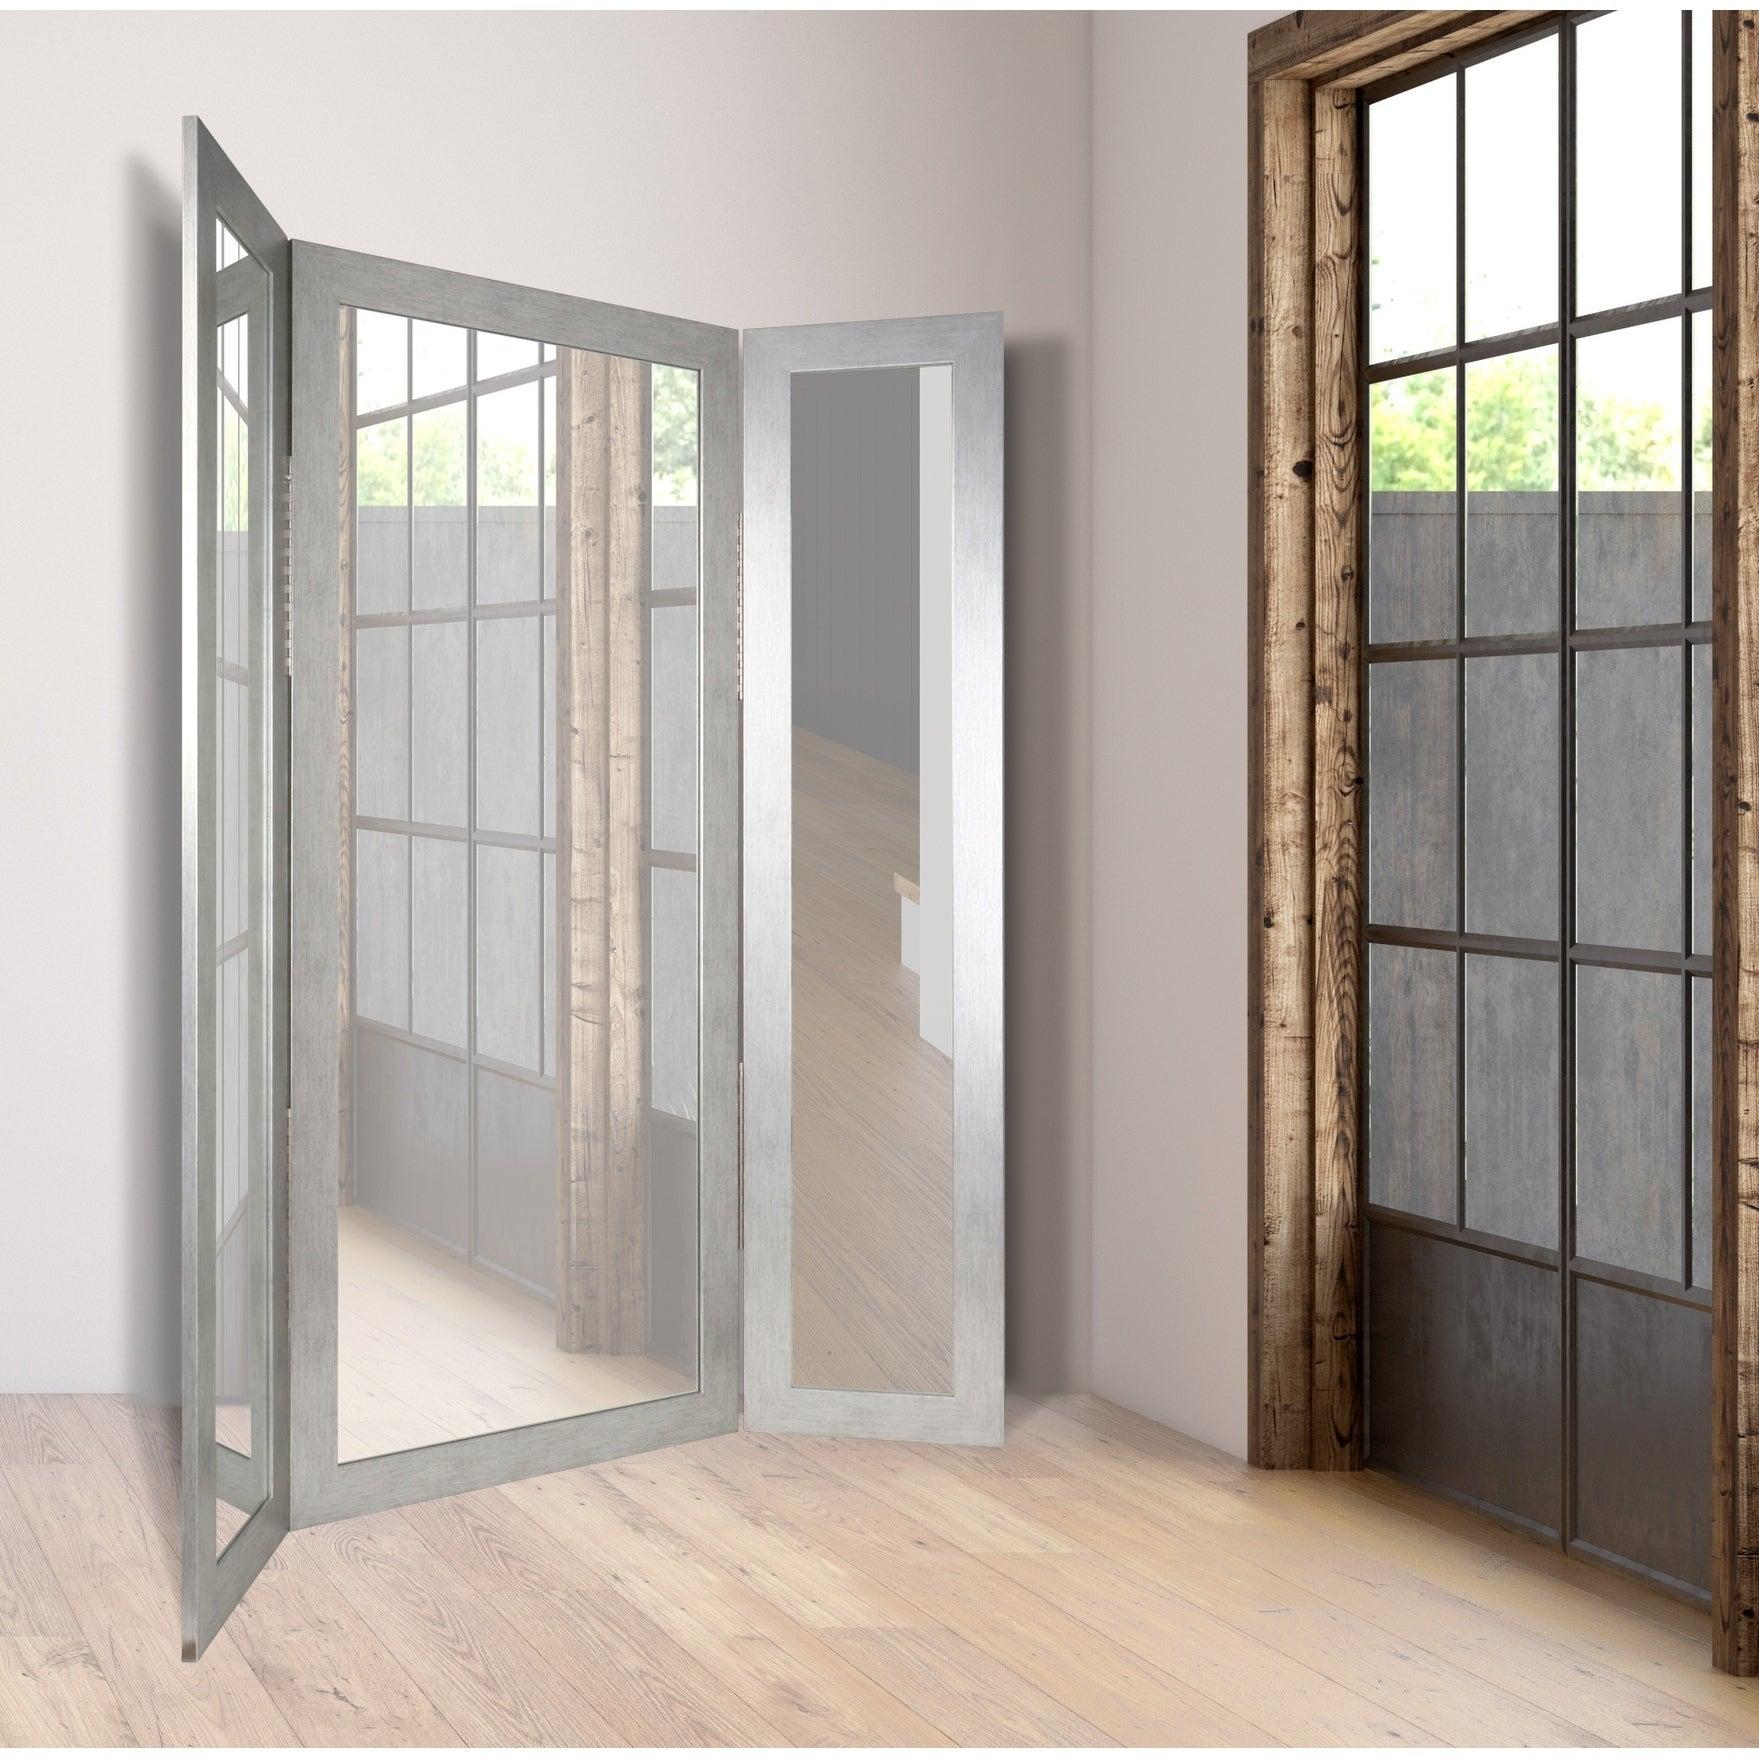 Silver Grain Tri Fold 64 Inch X 71 Dressing Mirror Free Shipping Today 25416243